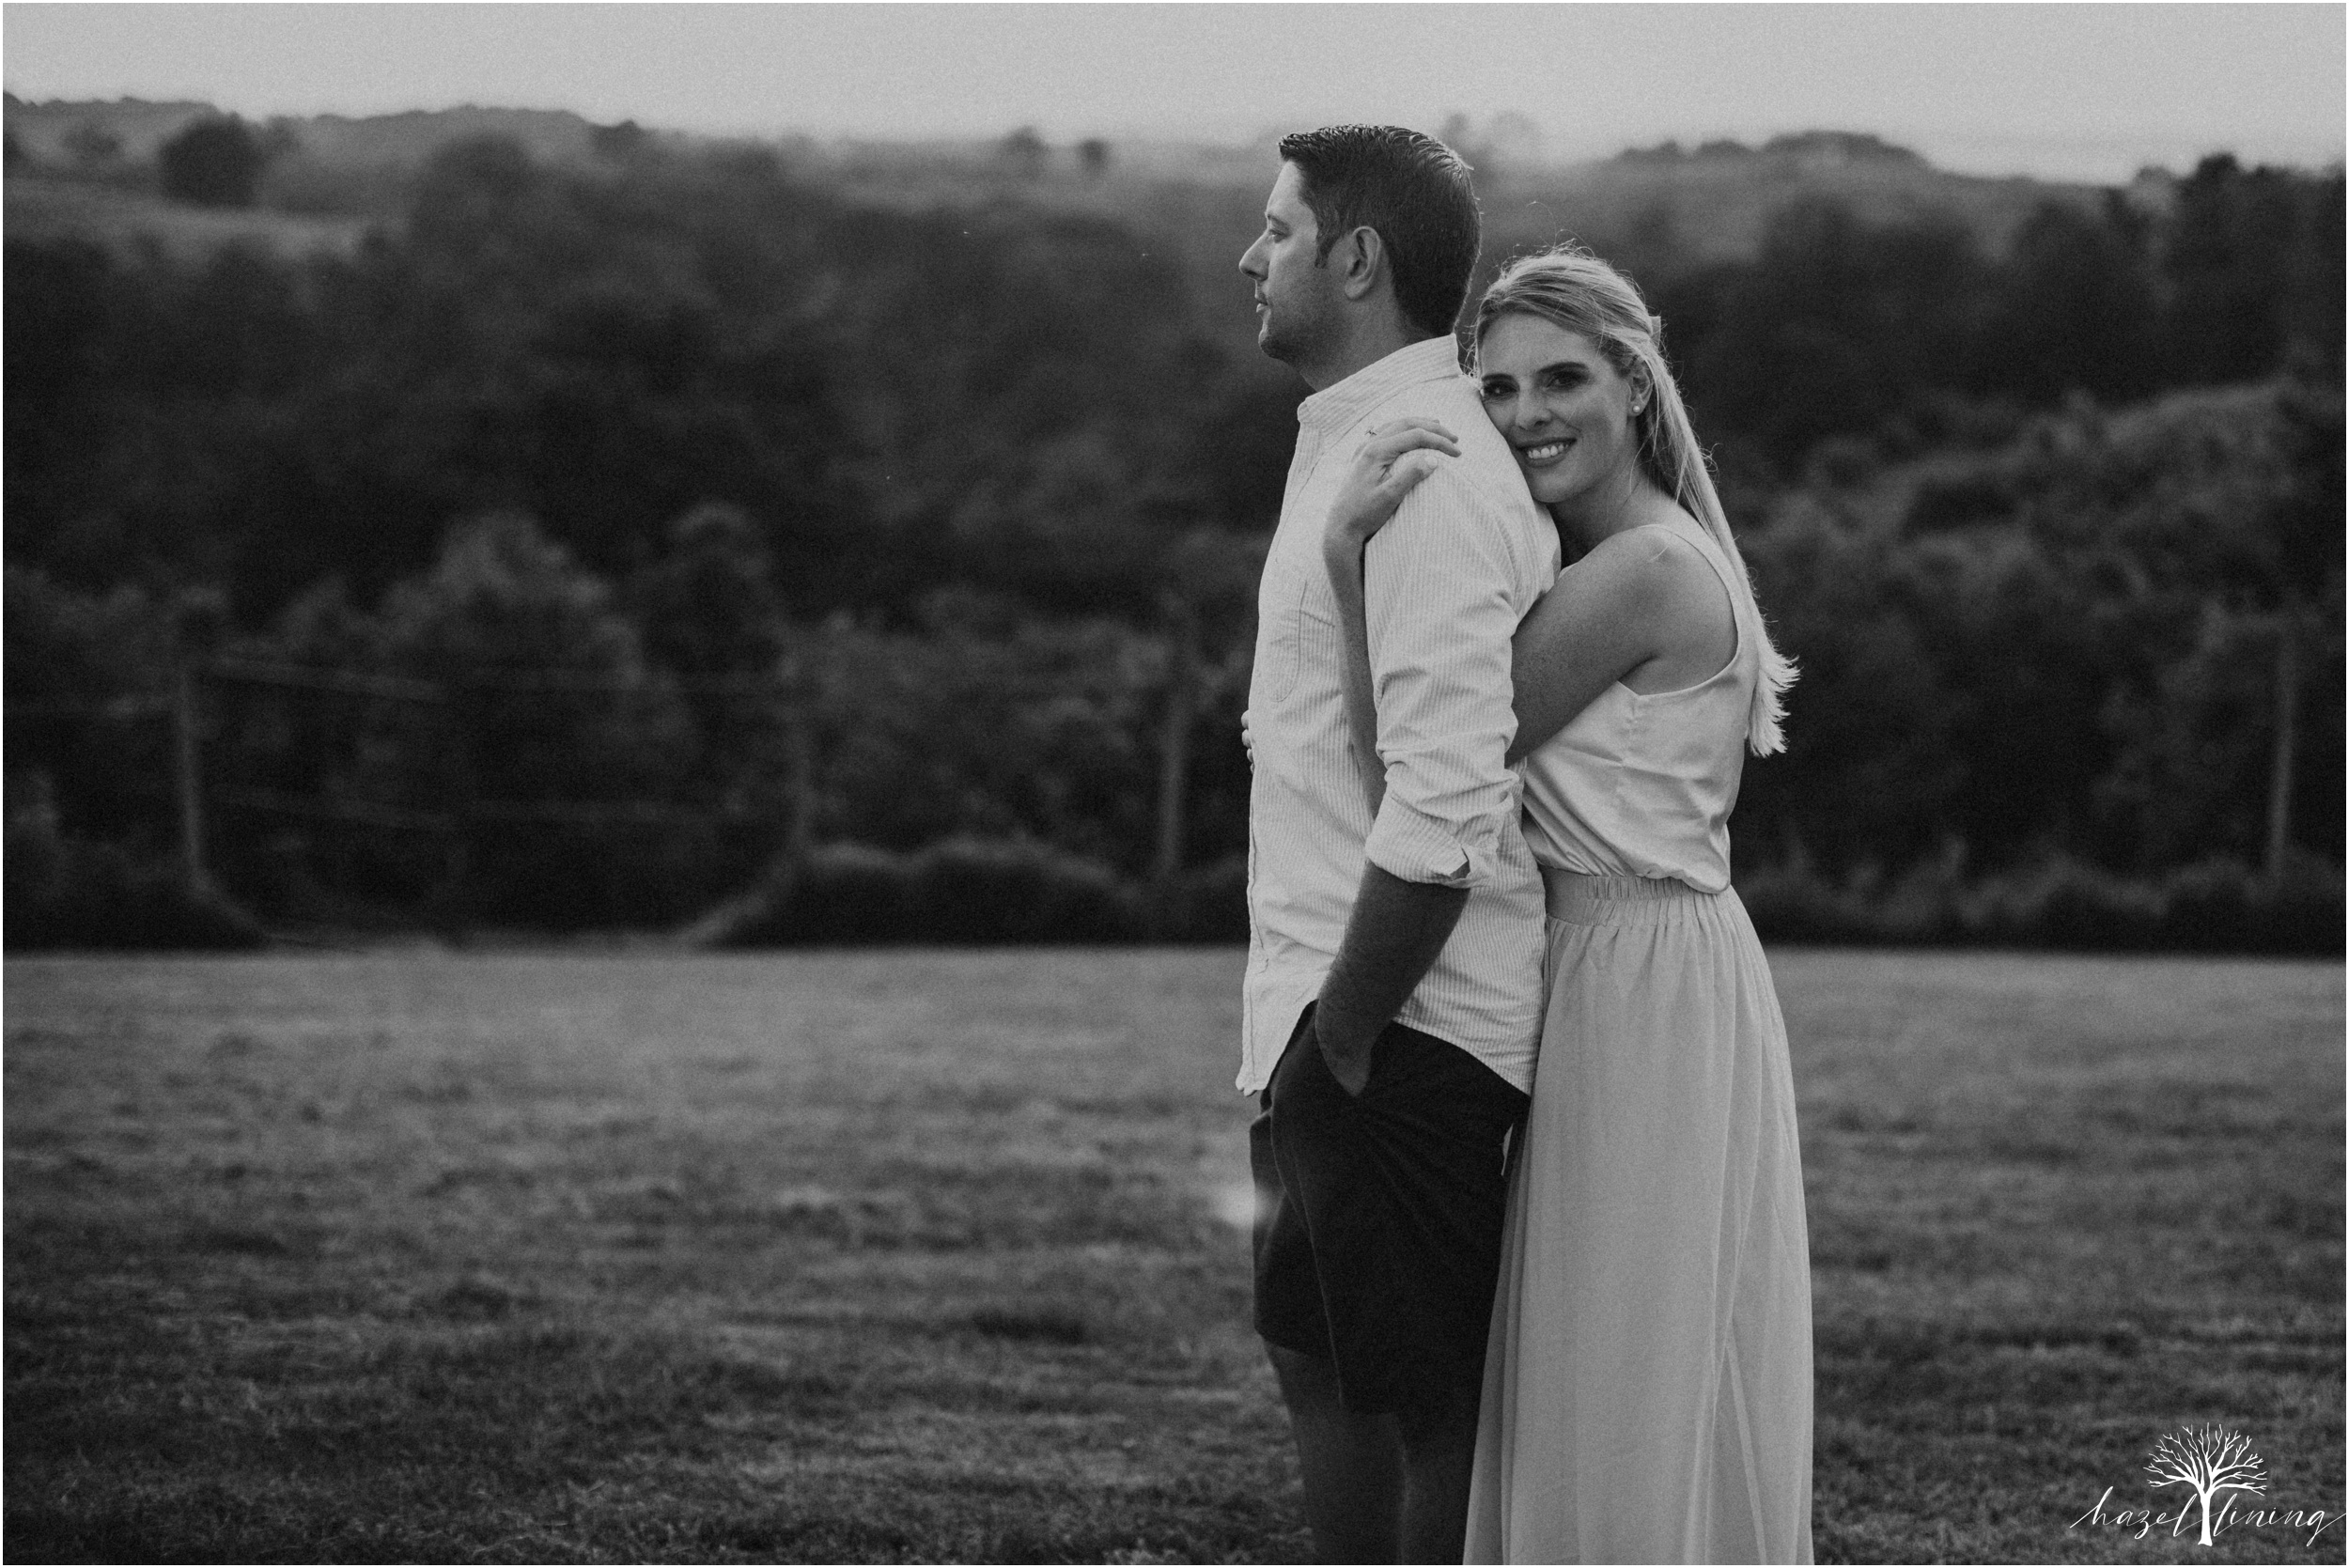 ashley-fillmore-steve-reimer-trexler-nature-preserve-summer-engagement-session-schnecksville-pennsylvania-hazel-lining-photography-destination-elopement-wedding-engagement-photography_0050.jpg